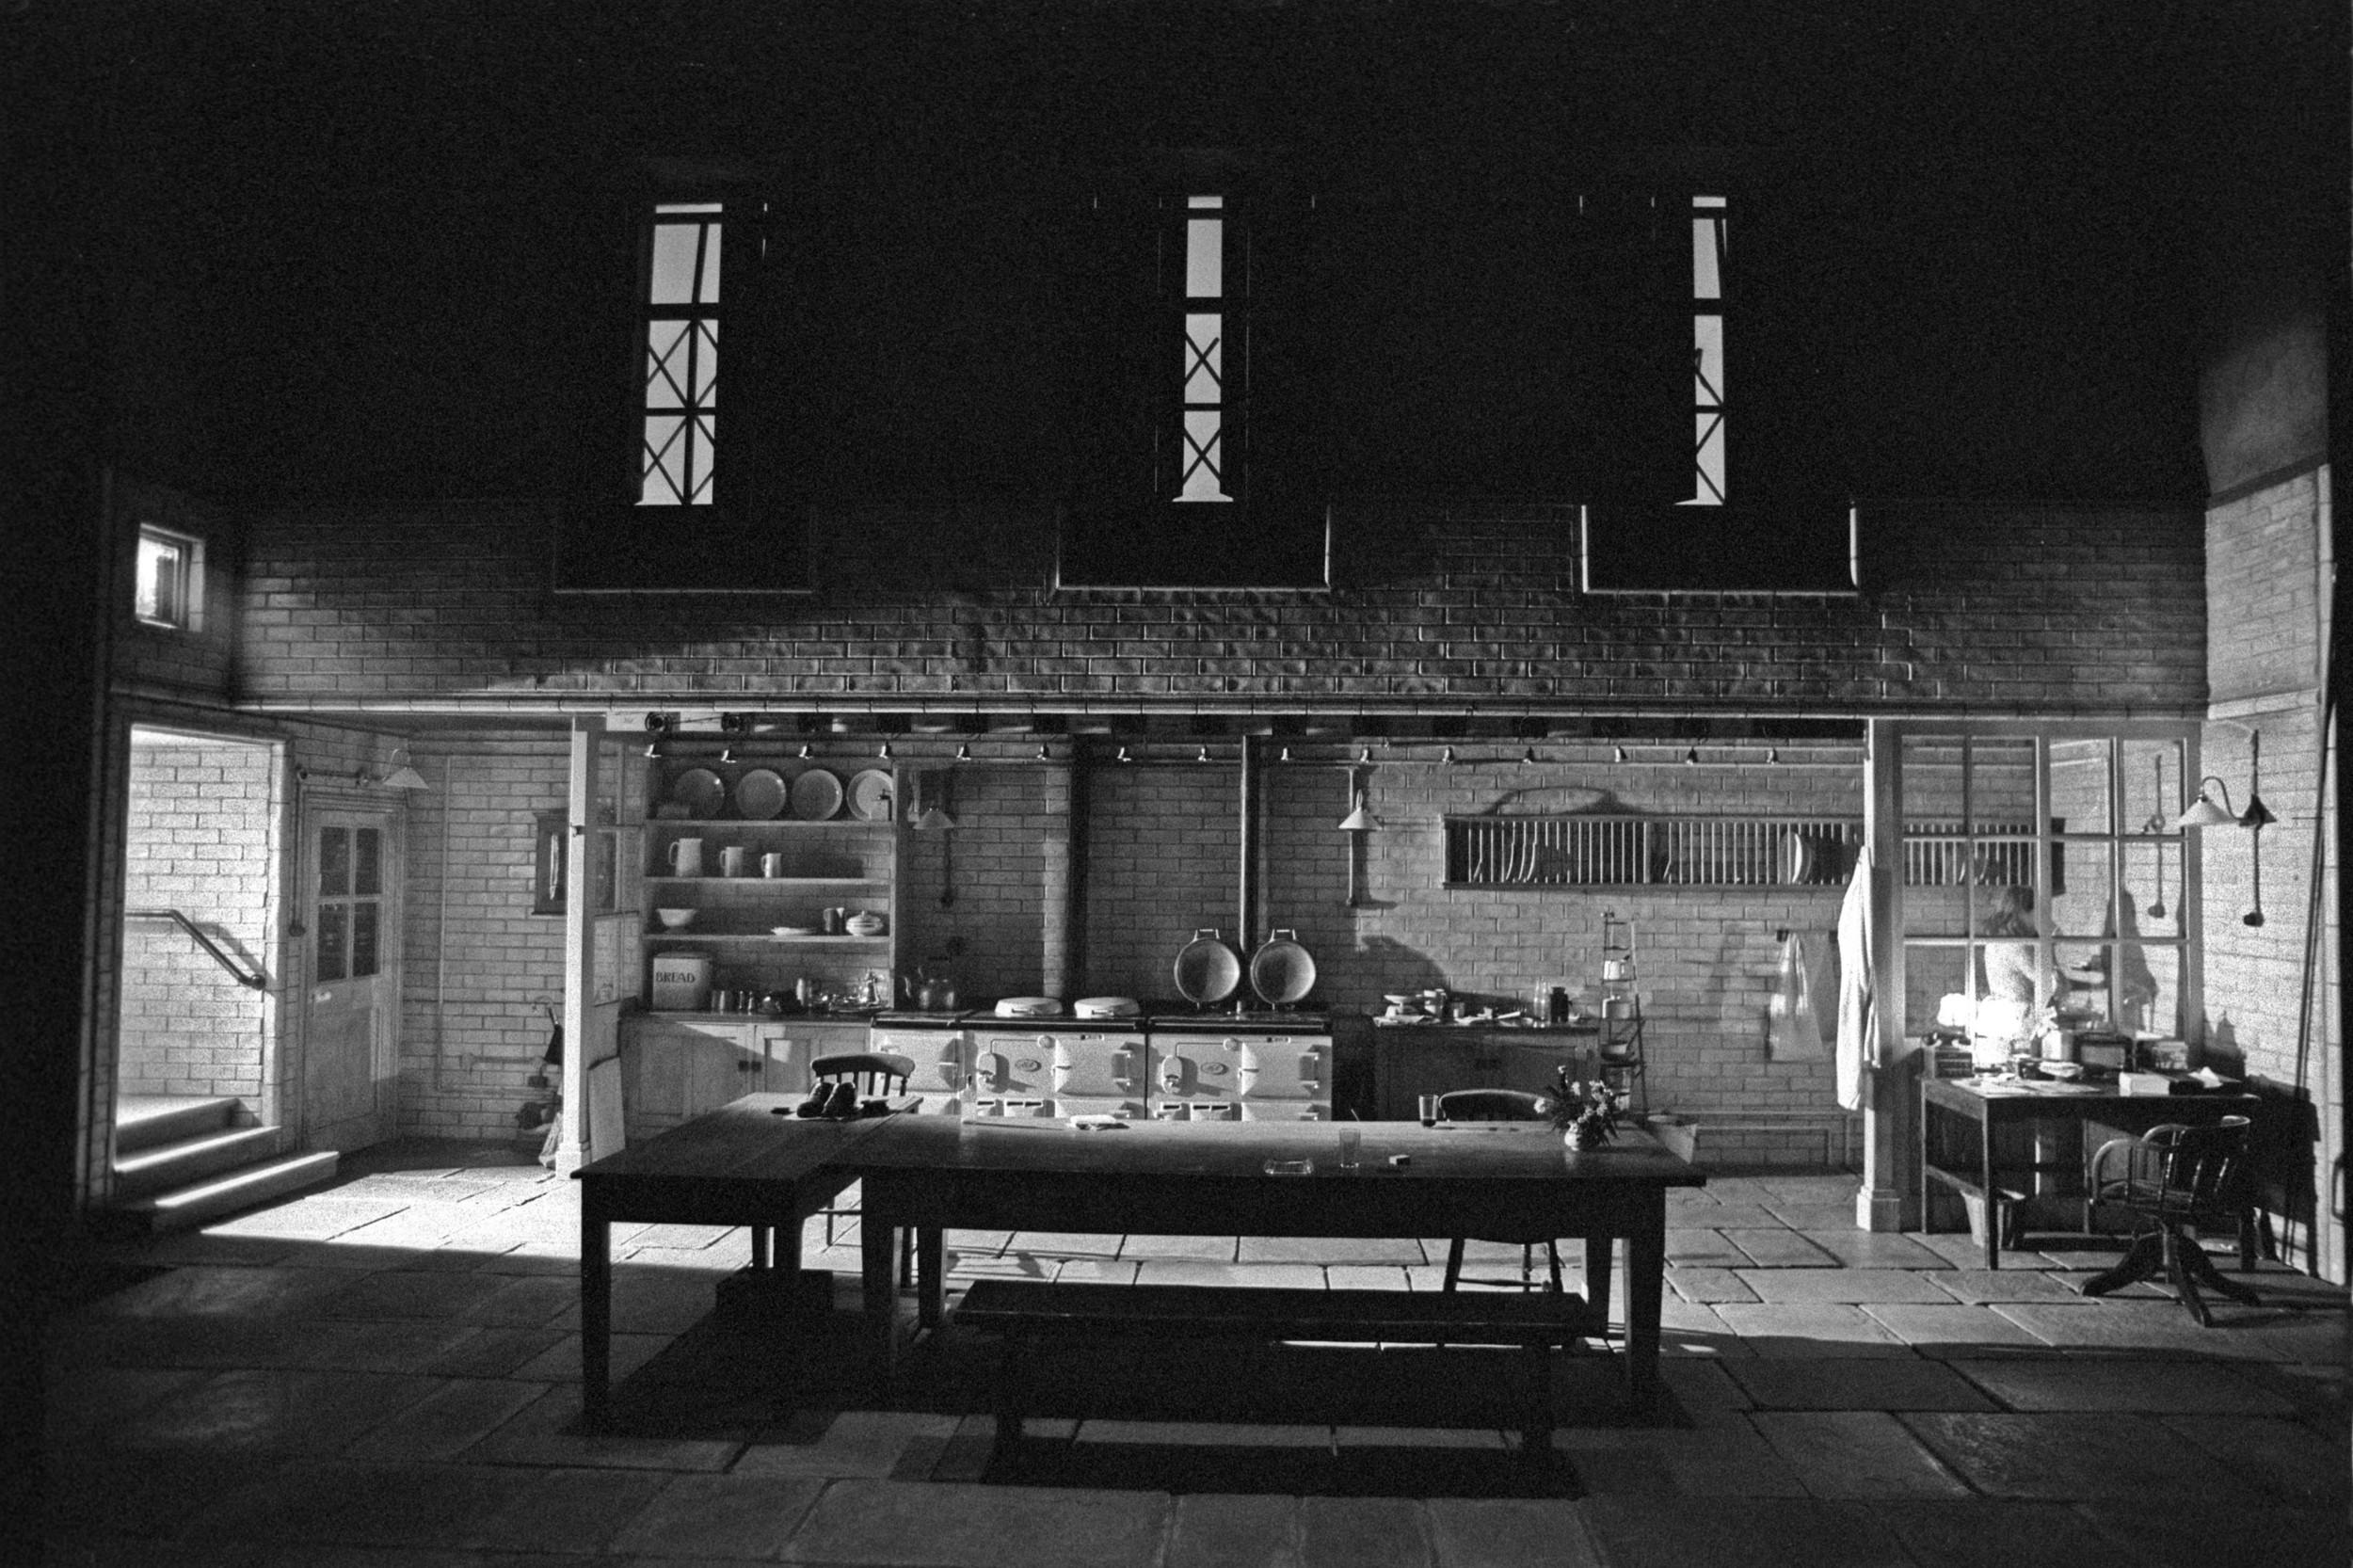 After Miss Julie-Donmar Warehouse 001.jpg